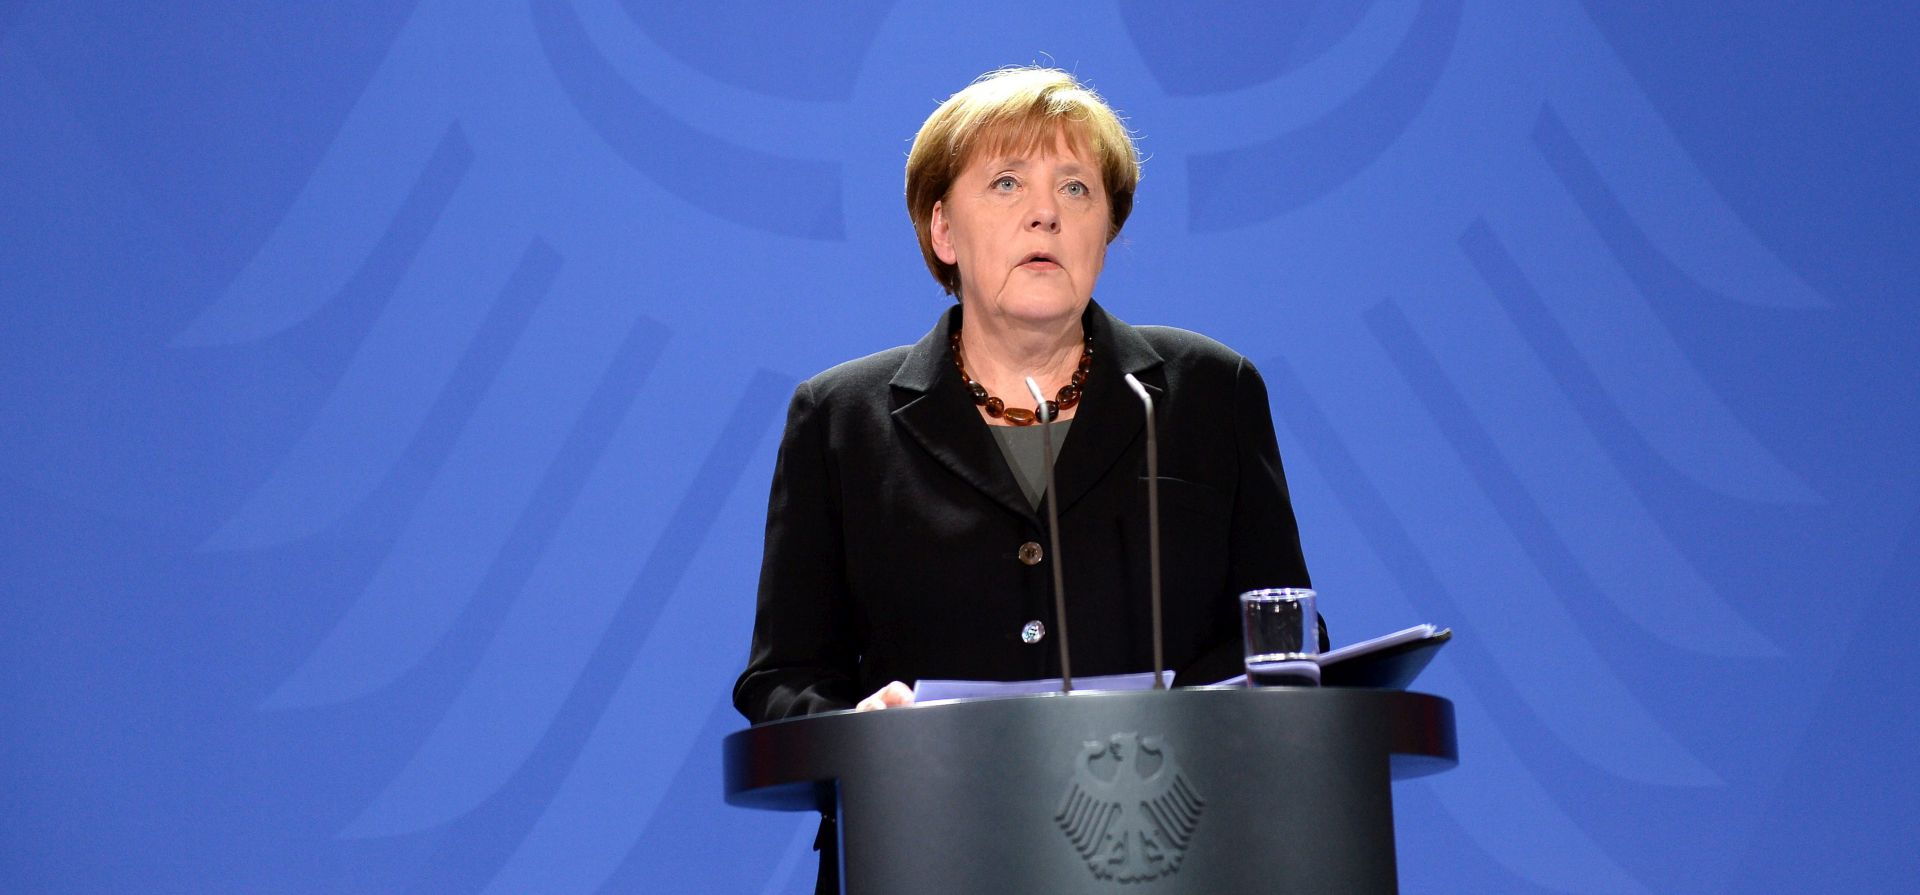 BEZ PRITISKA: Merkel odbija neformalne razgovore o Brexitu dok London ne podnese zahtjev za izlaskom